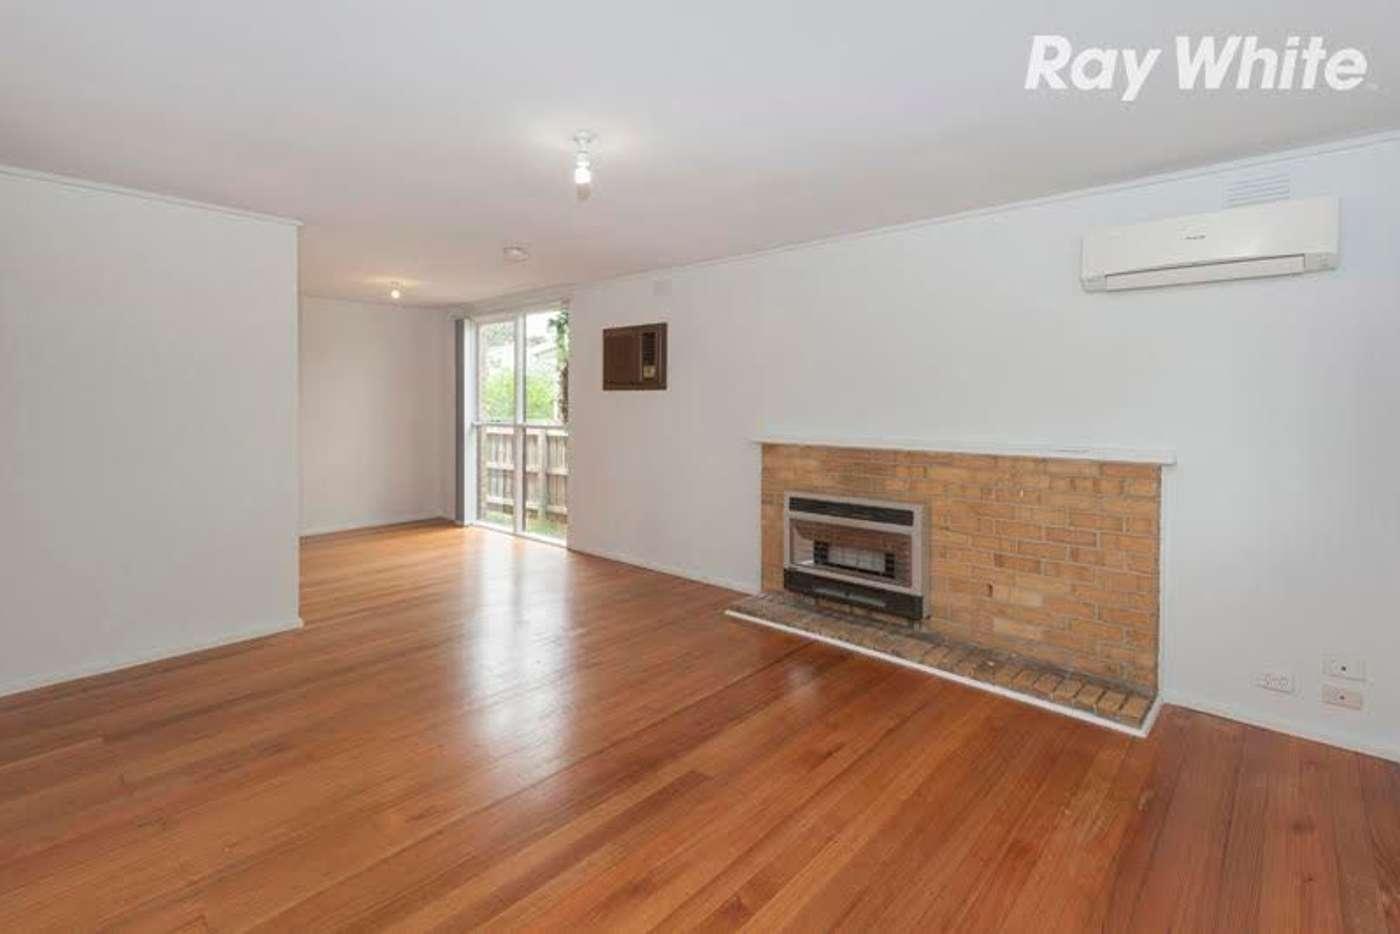 Main view of Homely house listing, 10 Murragong Avenue, Bundoora VIC 3083